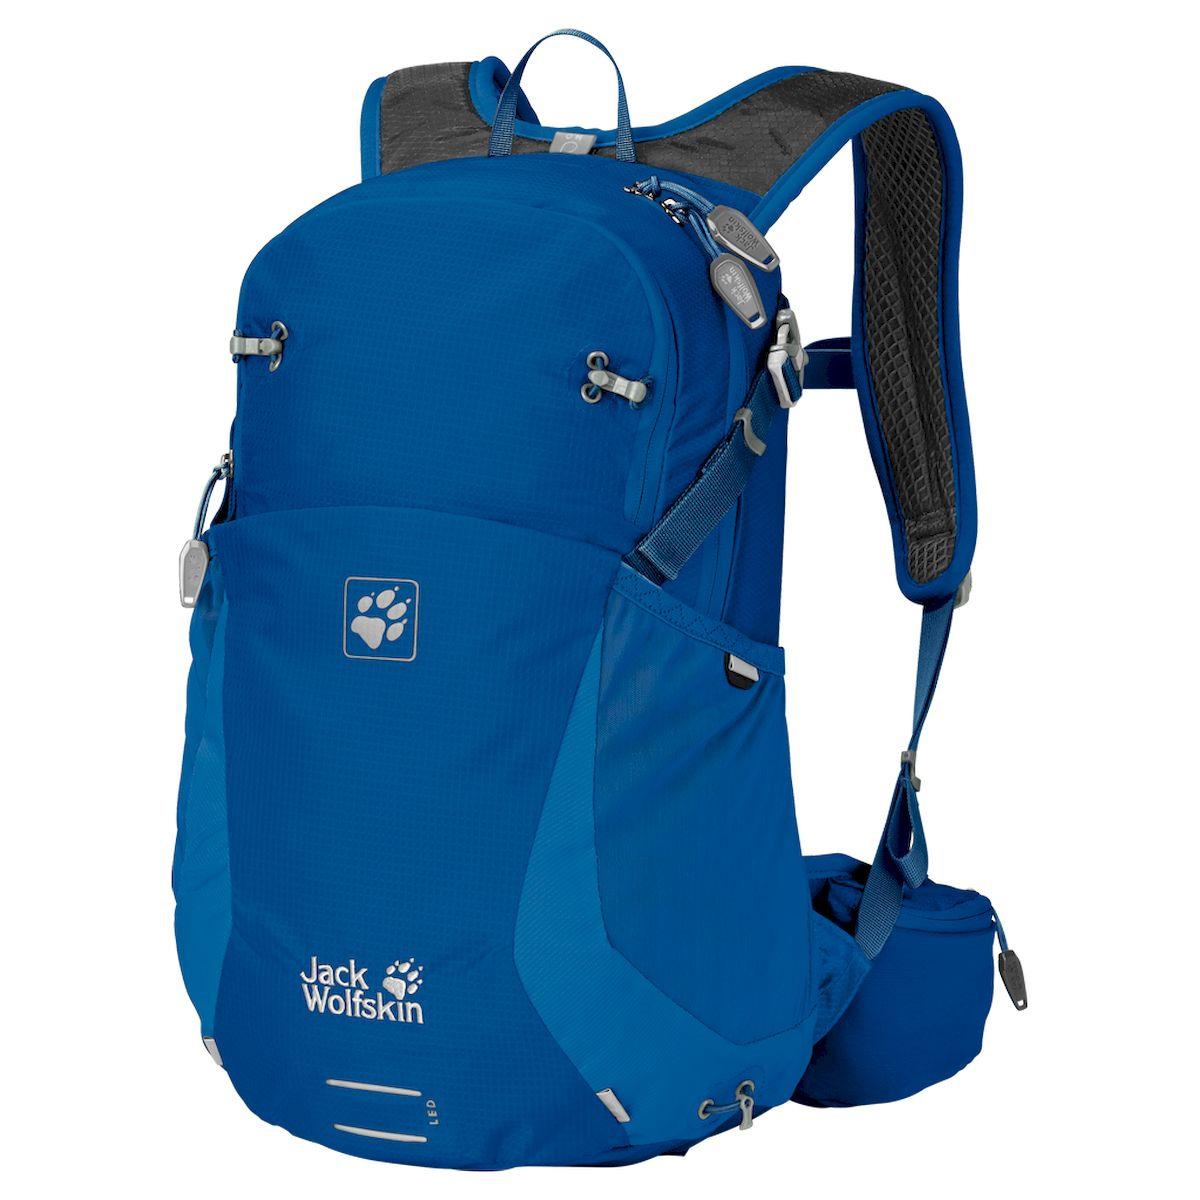 Рюкзак Jack Wolfskin Moab Jam 18, 2002313-1062, синий цена